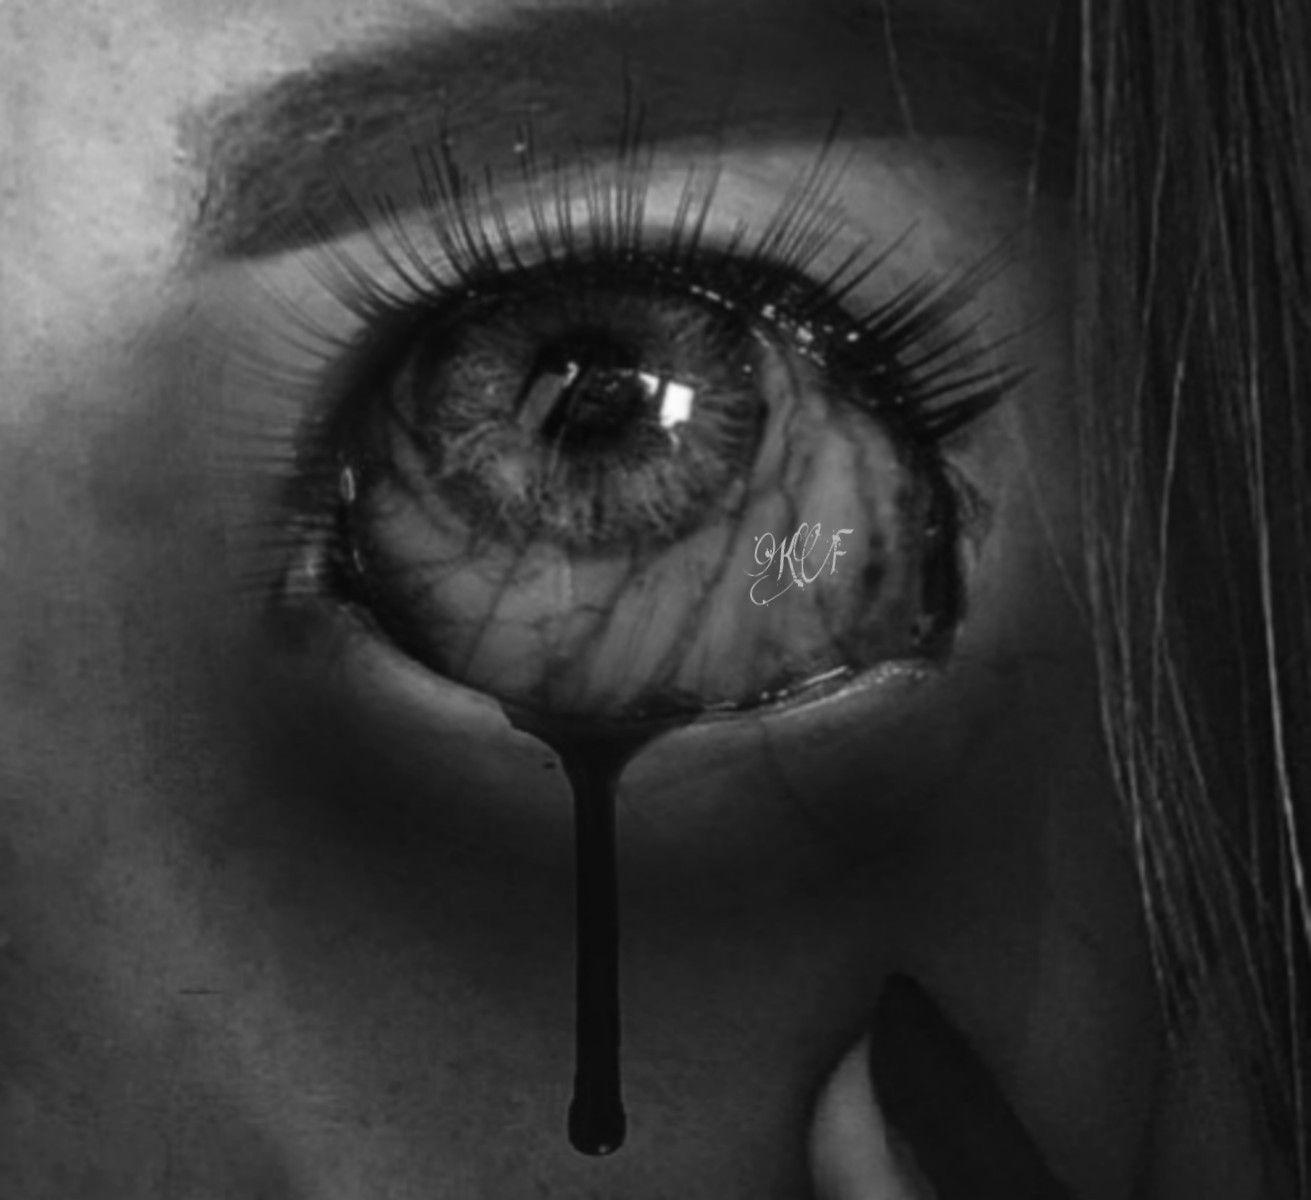 Pin By Kay Fernandez Del Campo On Just A Little Creepy Eye Art Cool Eyes Mystic Eye